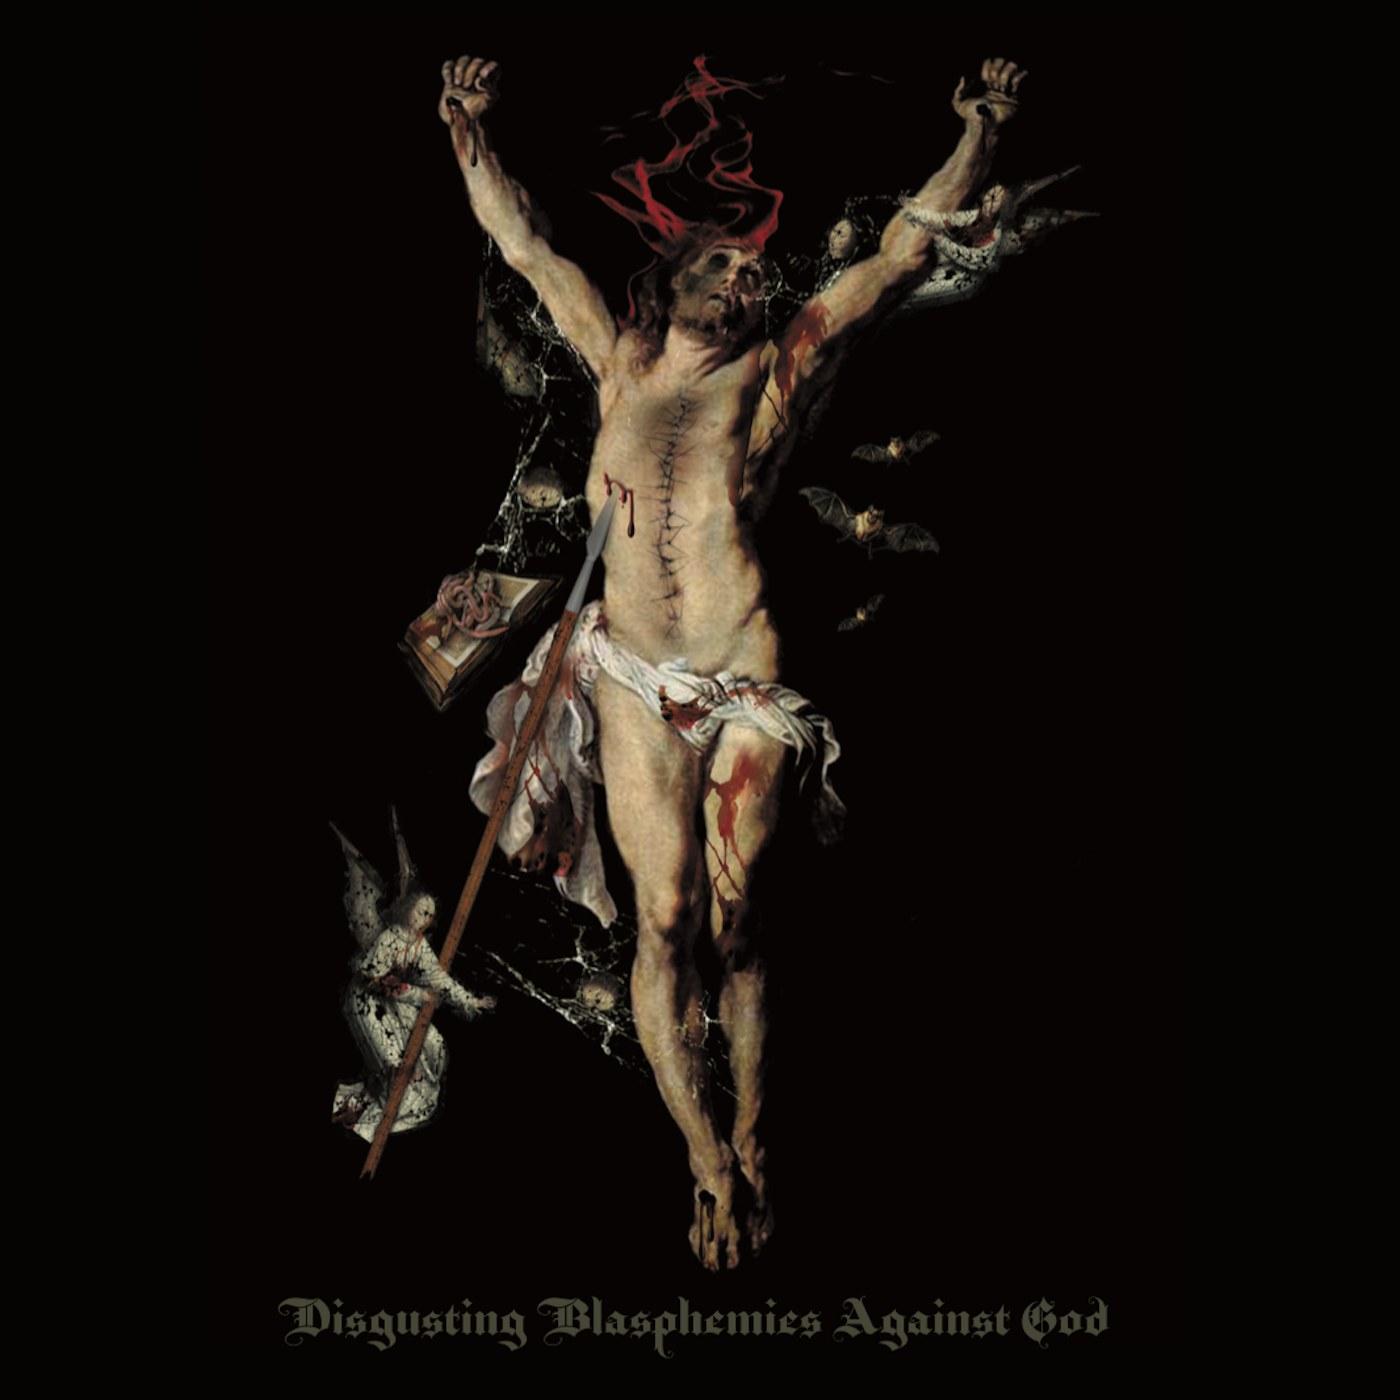 Review for Profanatica - Disgusting Blasphemies Against God